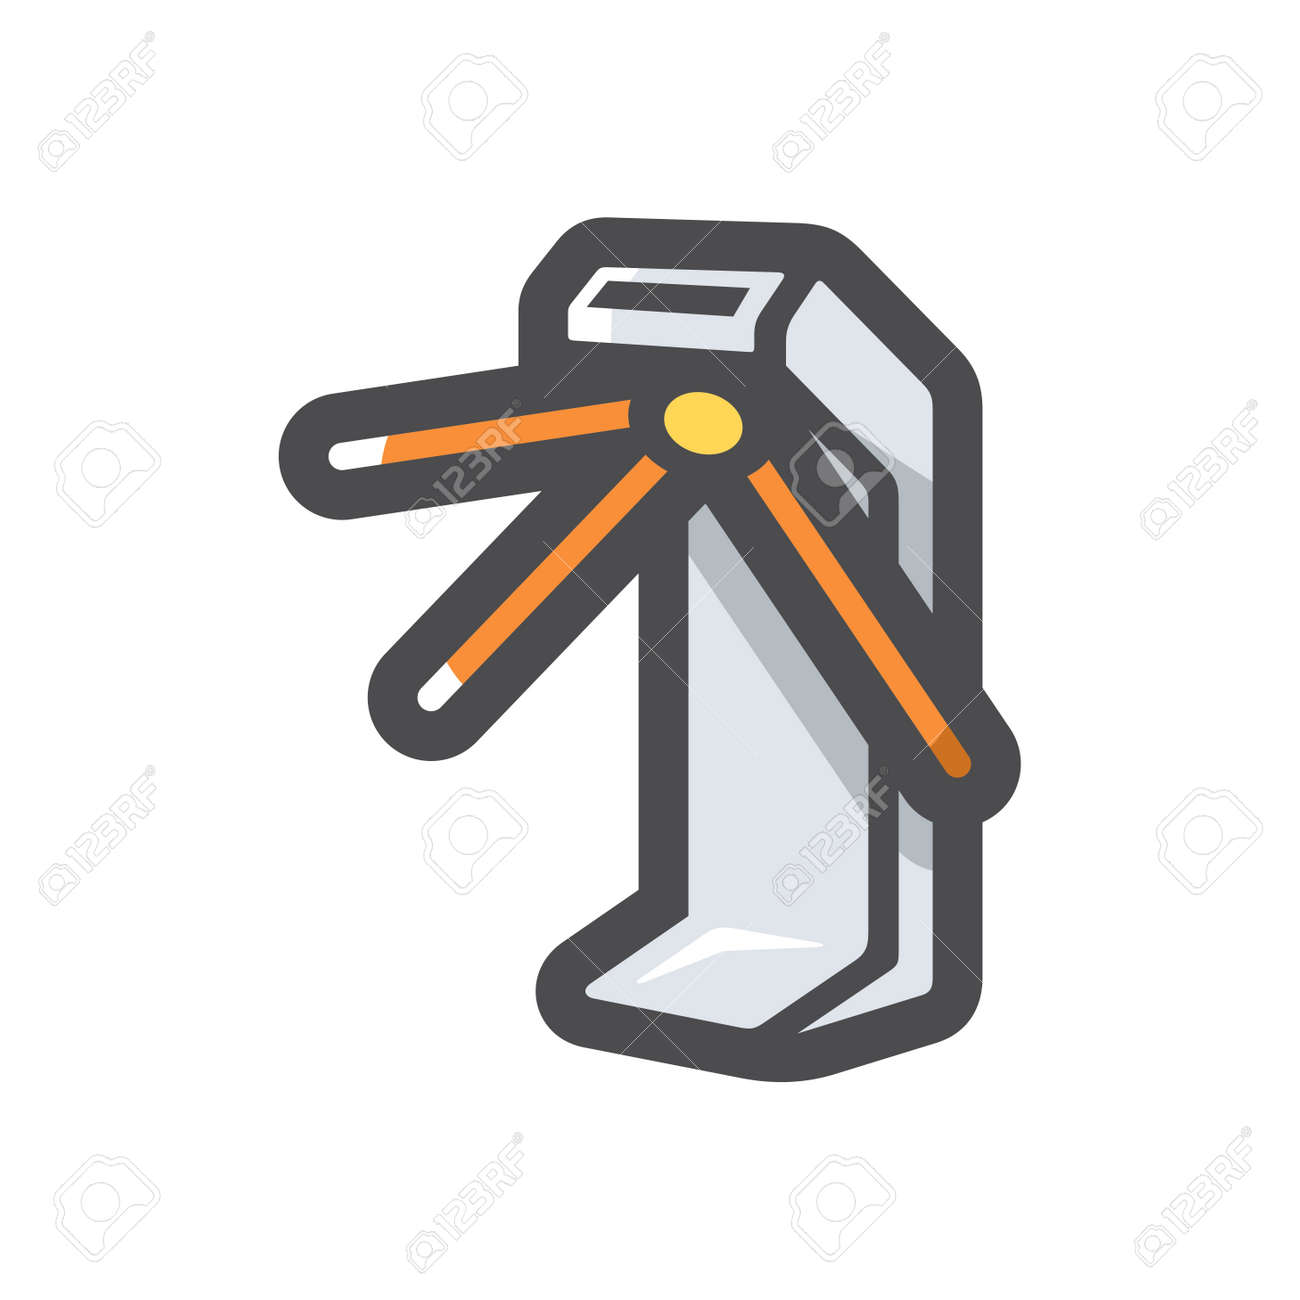 Turnstile security equipment Vector icon Cartoon illustration. - 171392941